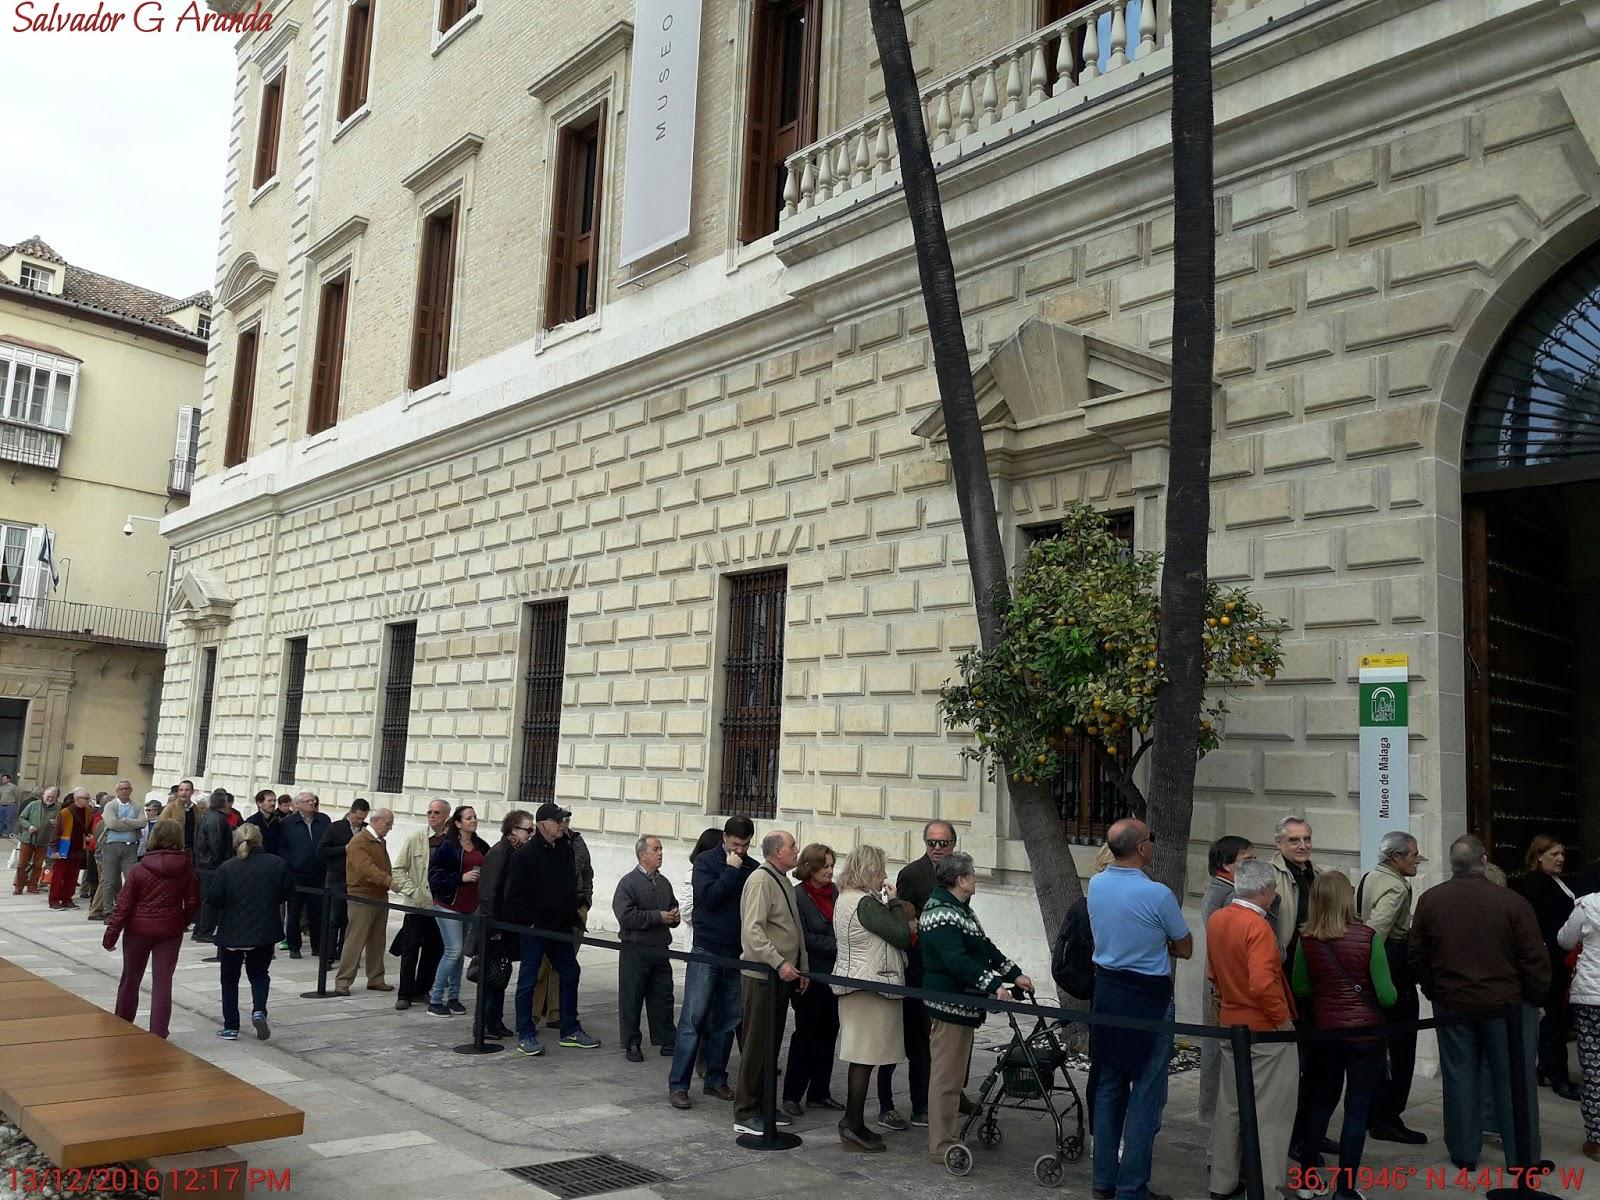 malaga monumental la apertura del museo de la aduana 12